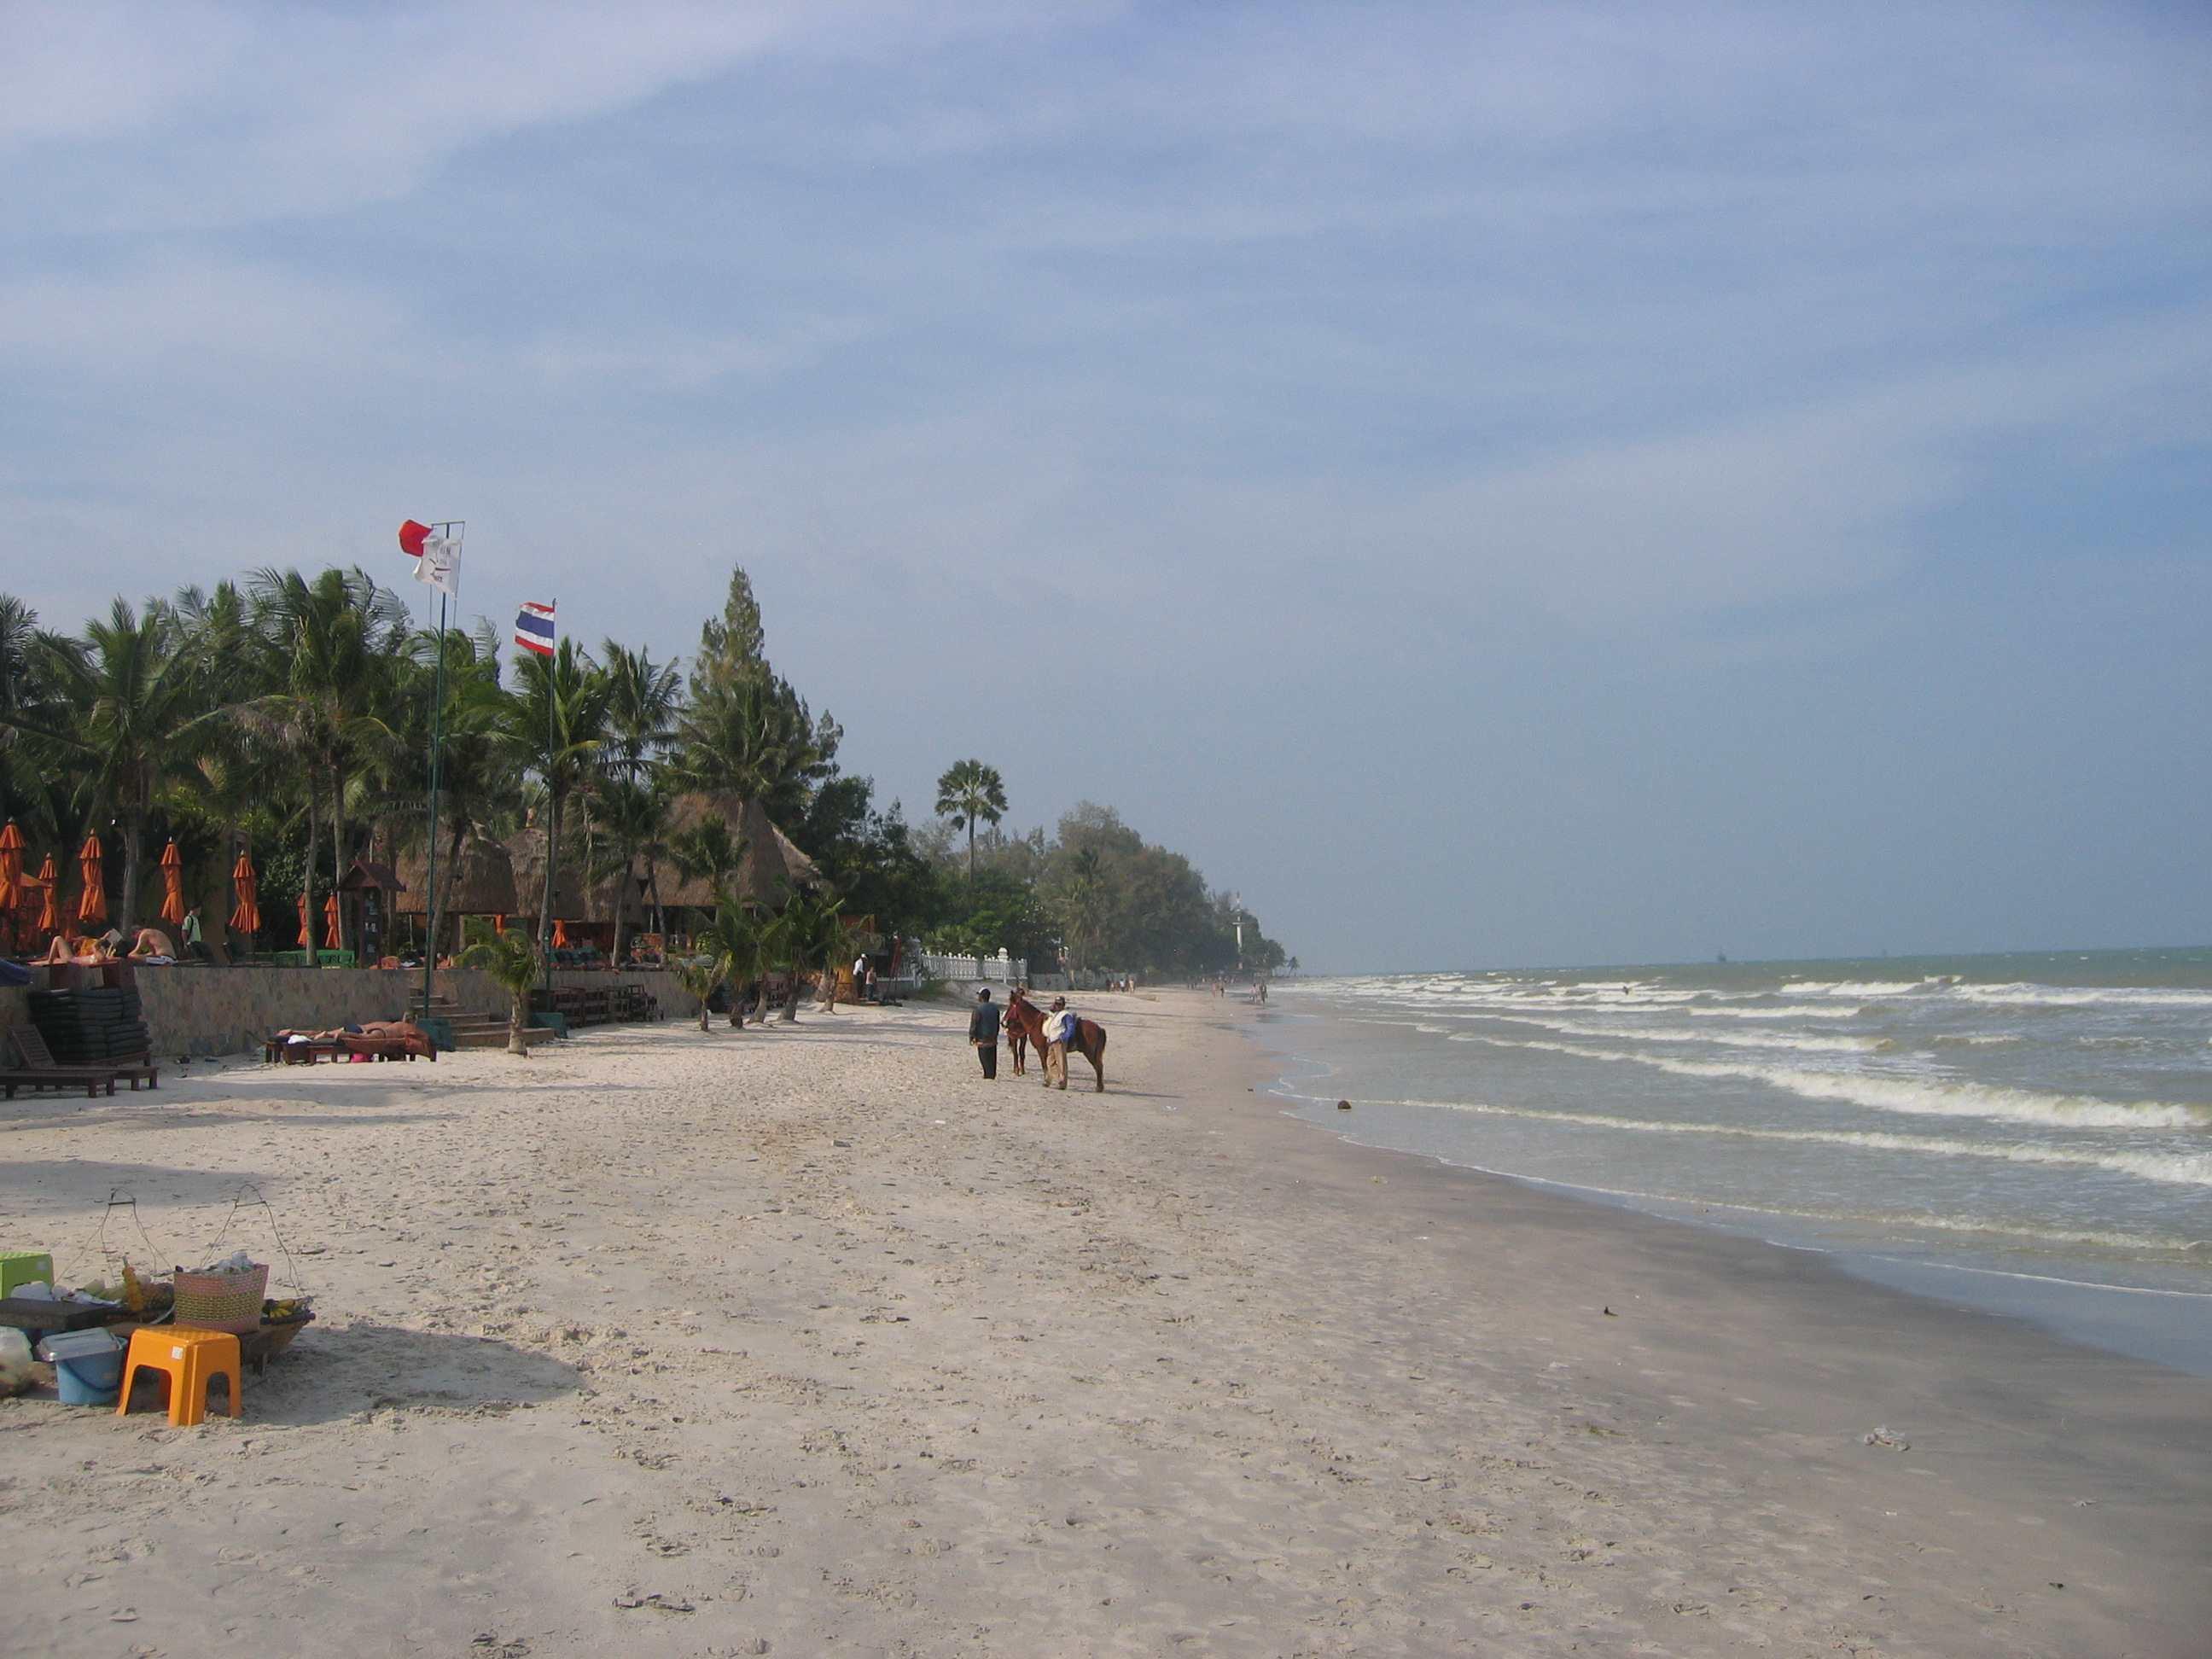 фото женщин на пляже без комплексов